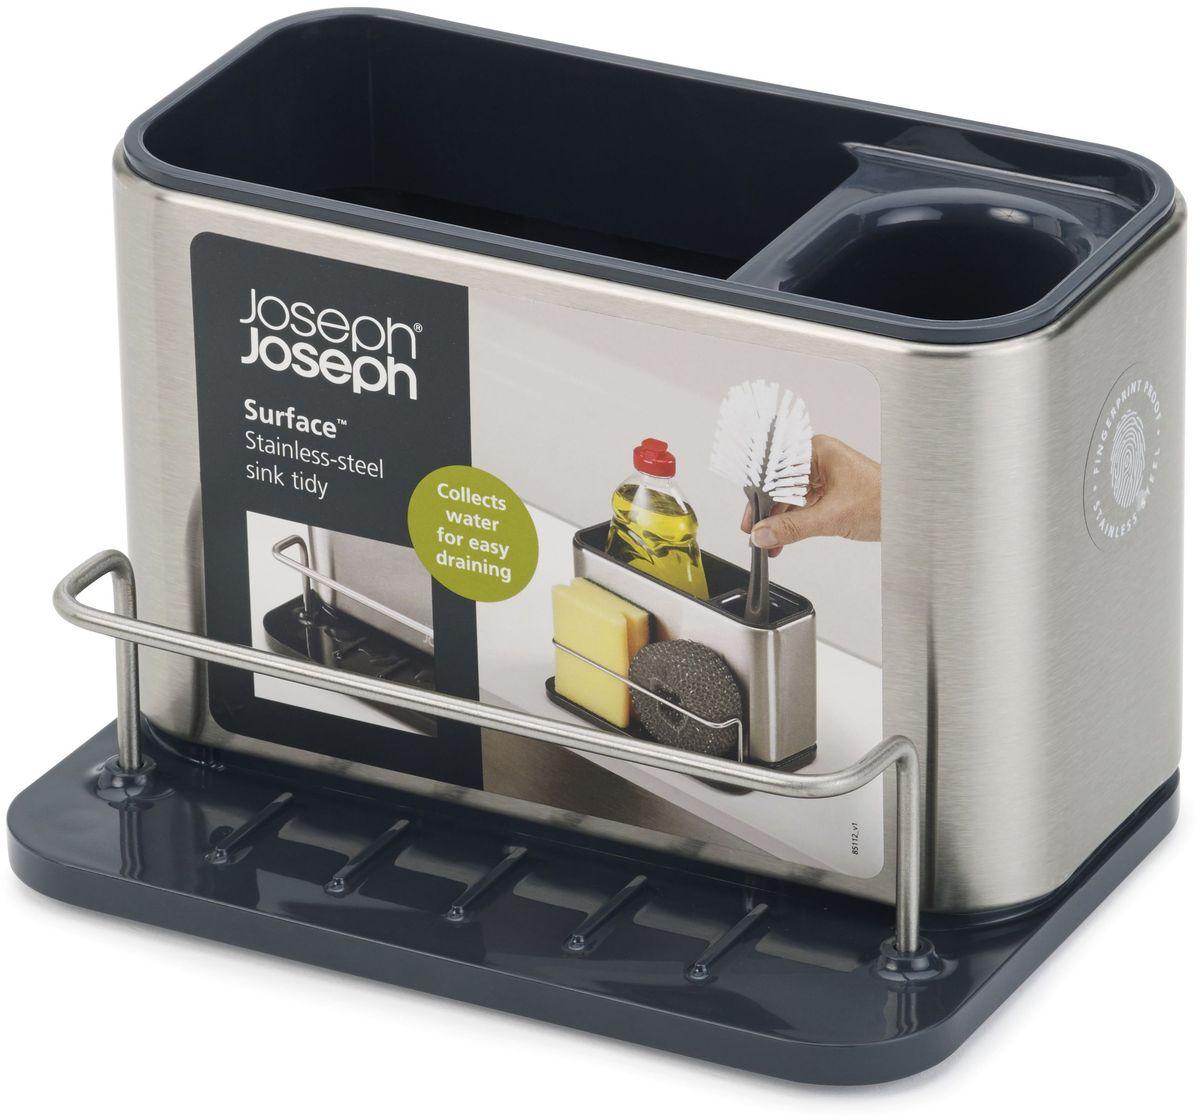 Подставка для кухонных принадлежностей Joseph Joseph Surface, 12,5 х 18 х 12,8 см органайзер для раковины joseph joseph surface из нержавеющей стали 85112